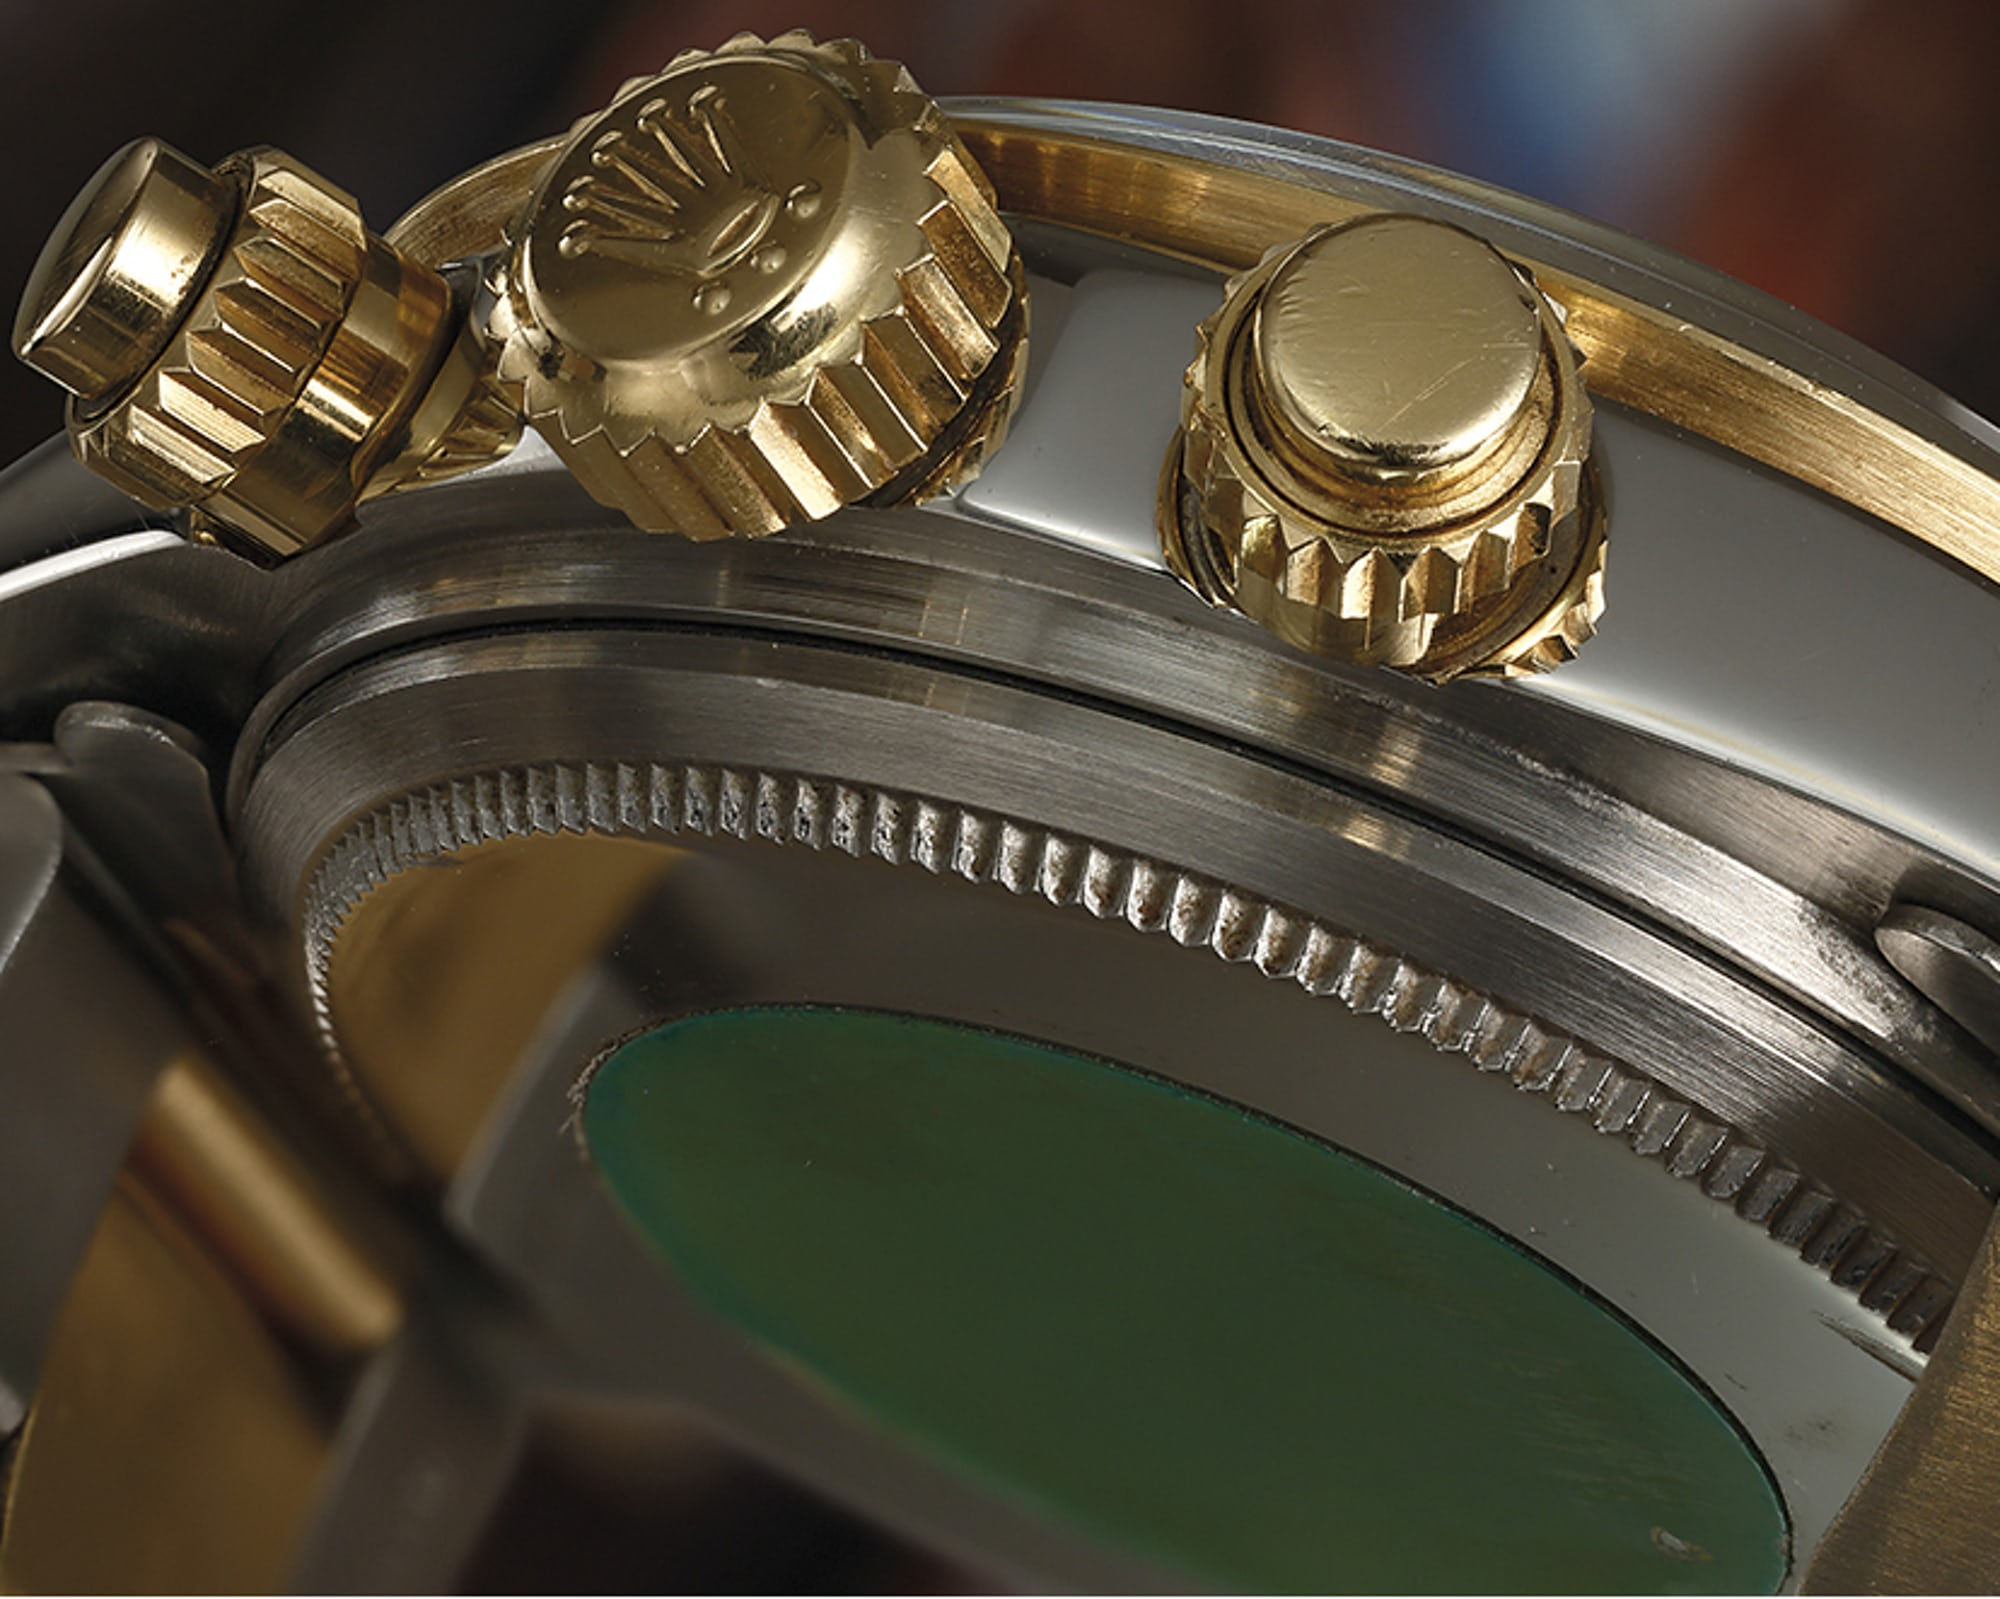 <p>18k yellow gold screw-down chronograph pushers, yowza.</p>